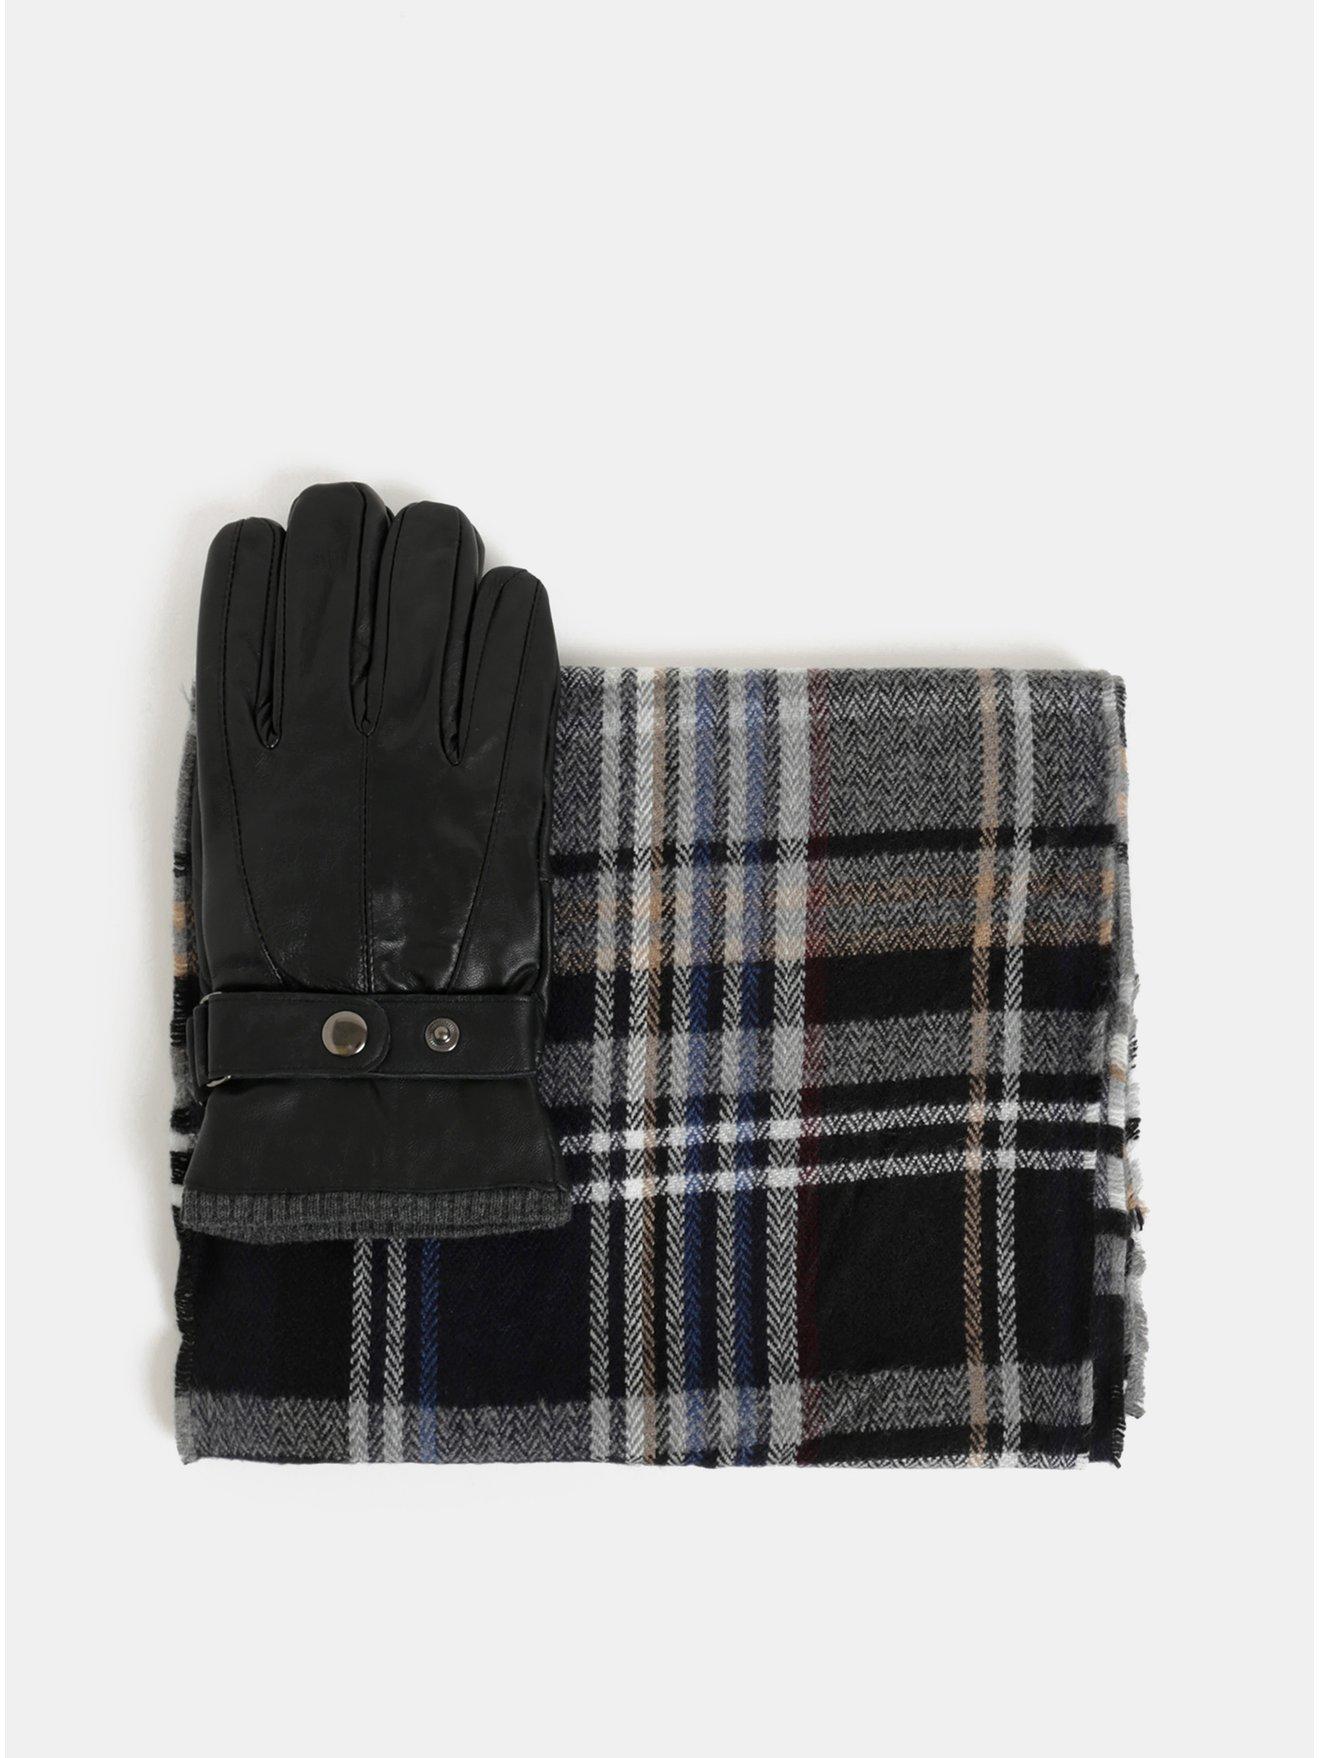 Sada šály a kožených rukavic v černé barvě v dárkové krabičce Portland 554b8e921a